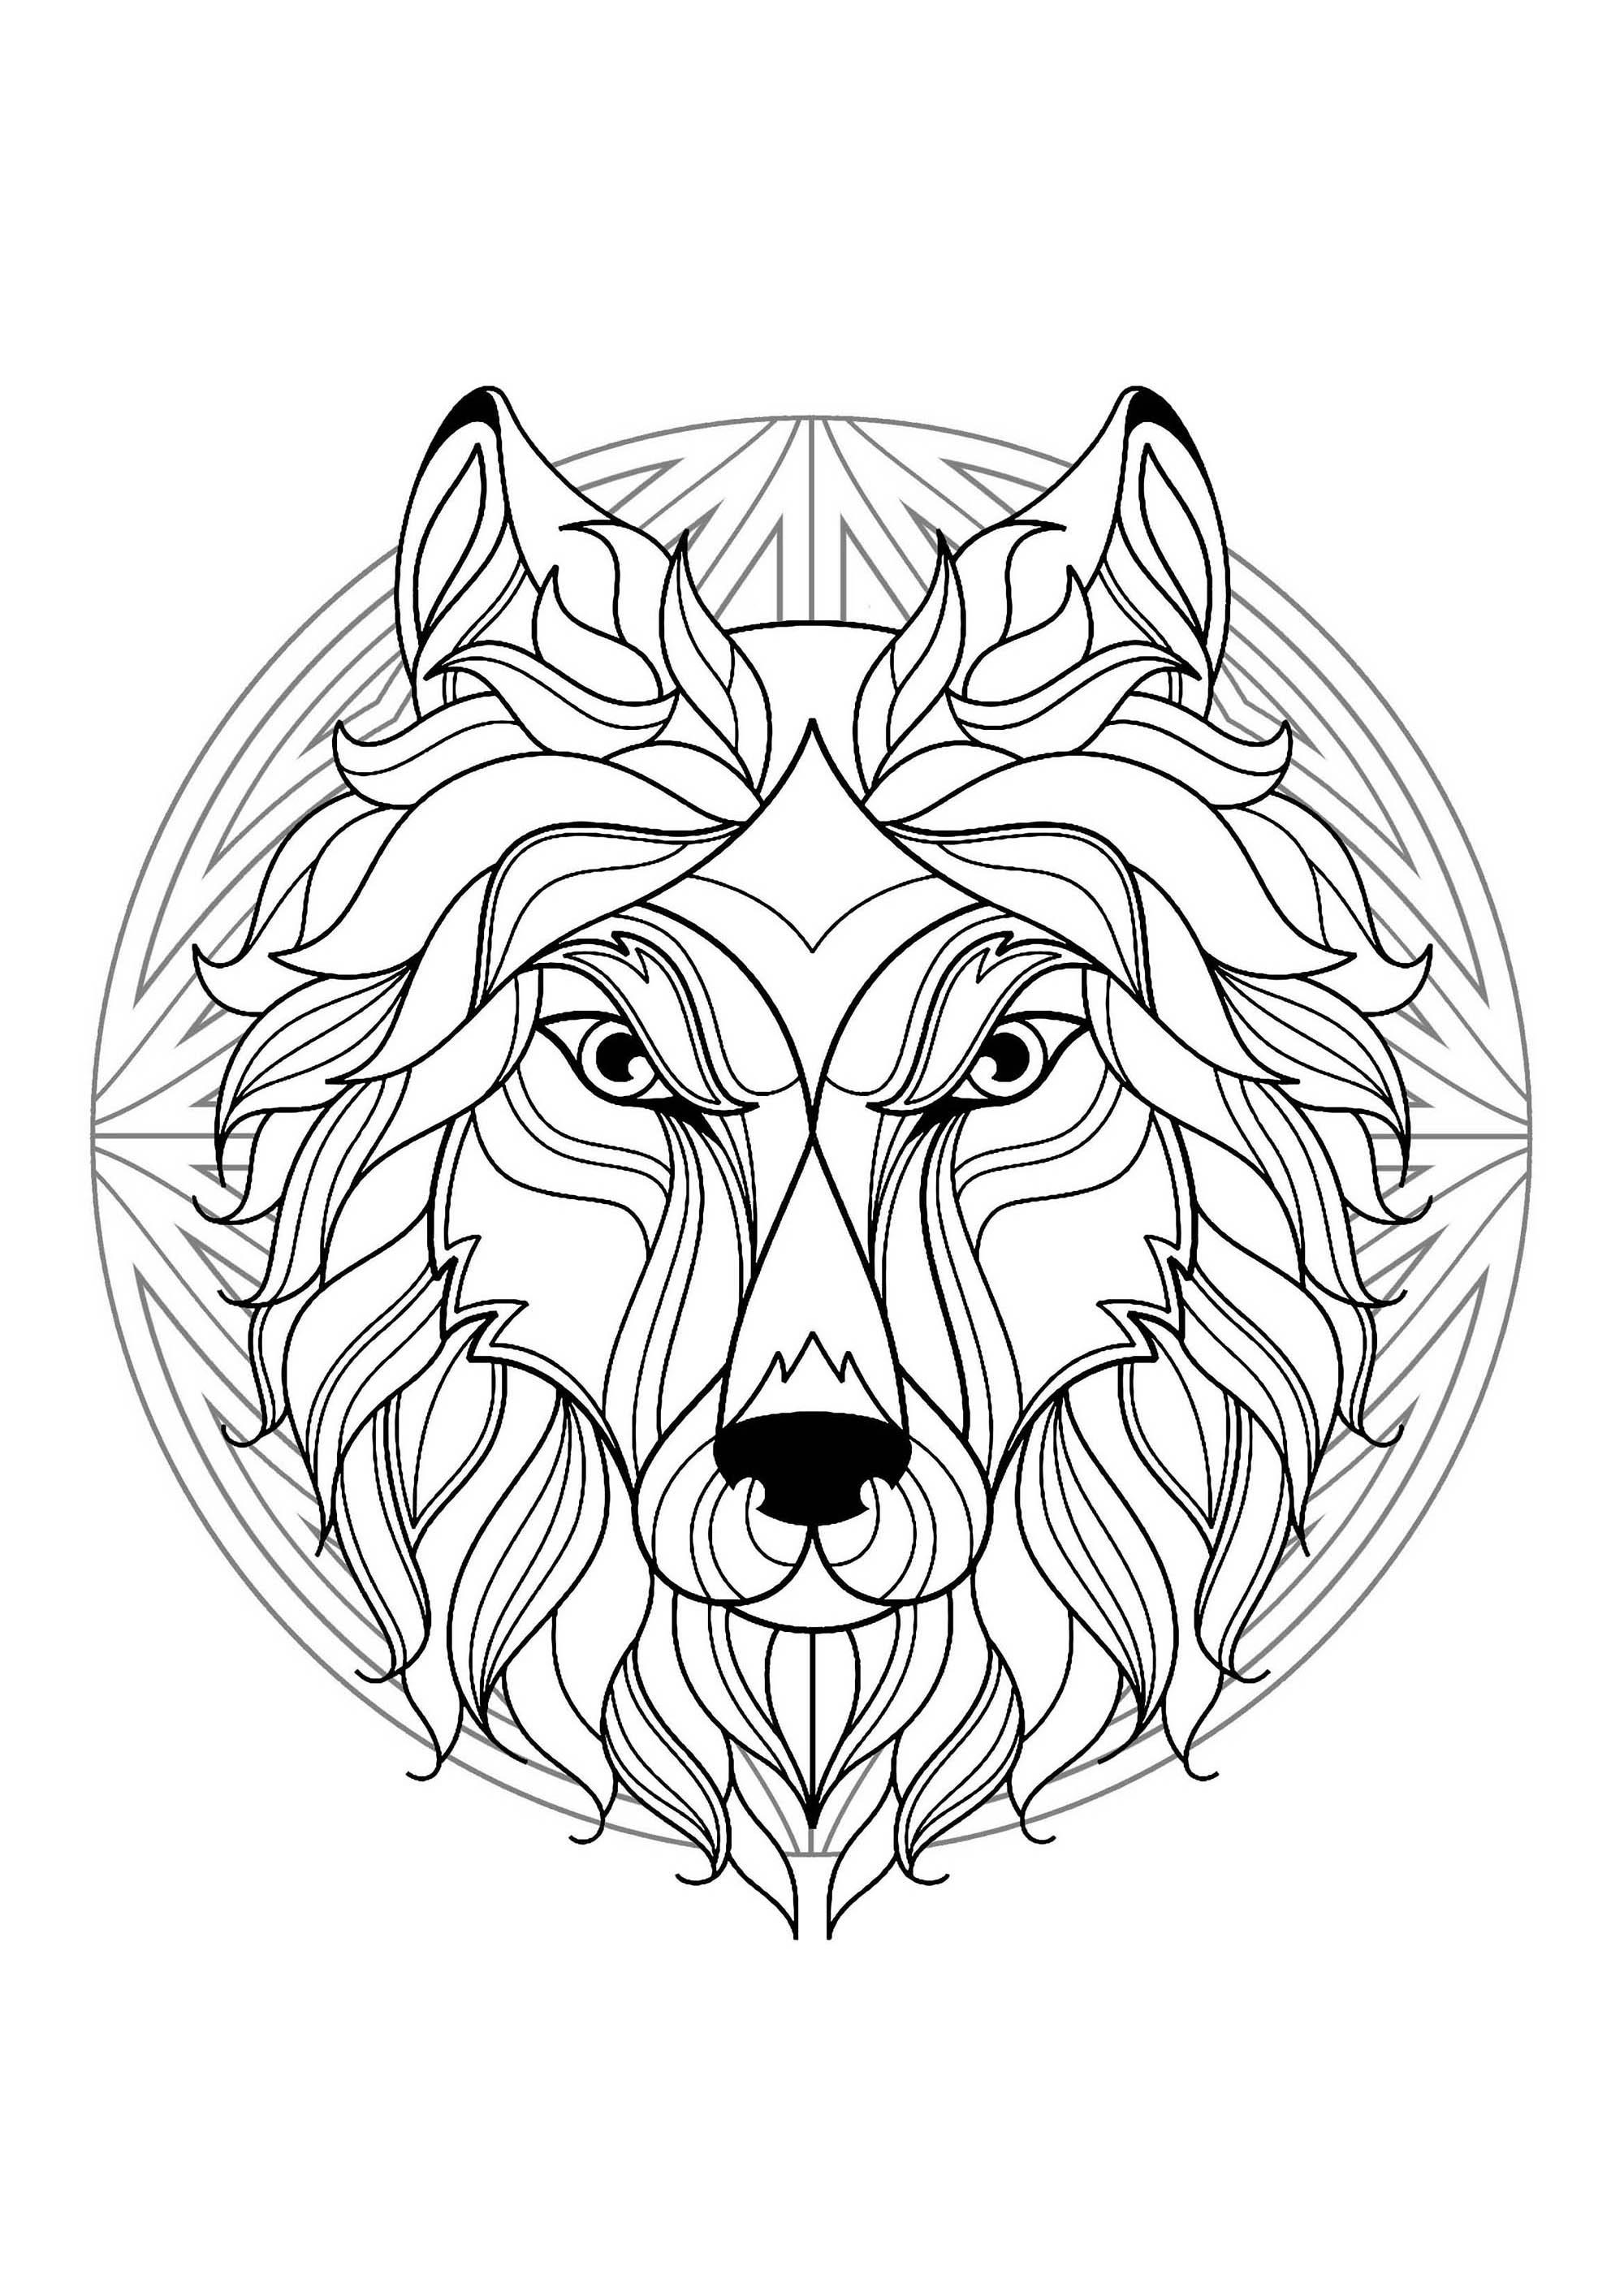 2000x2828 Mandala With Elegant Wolf Head And Beautiful Patterns